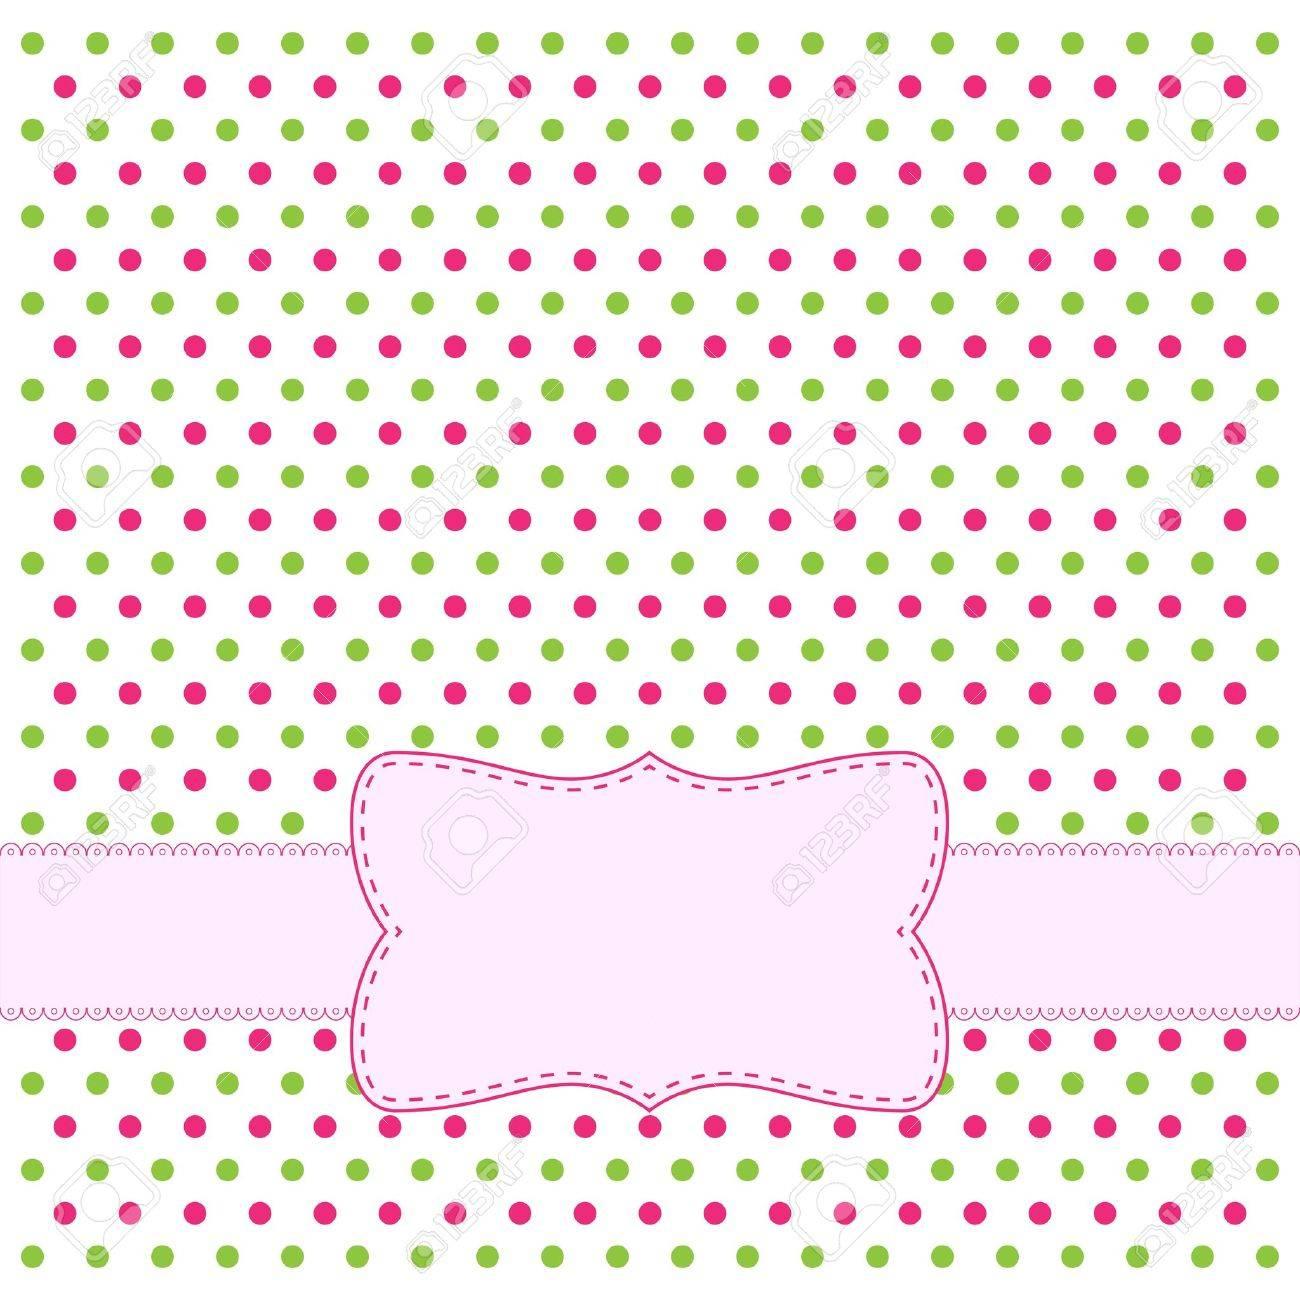 Polka dot design frame for invitation Stock Vector - 12483083